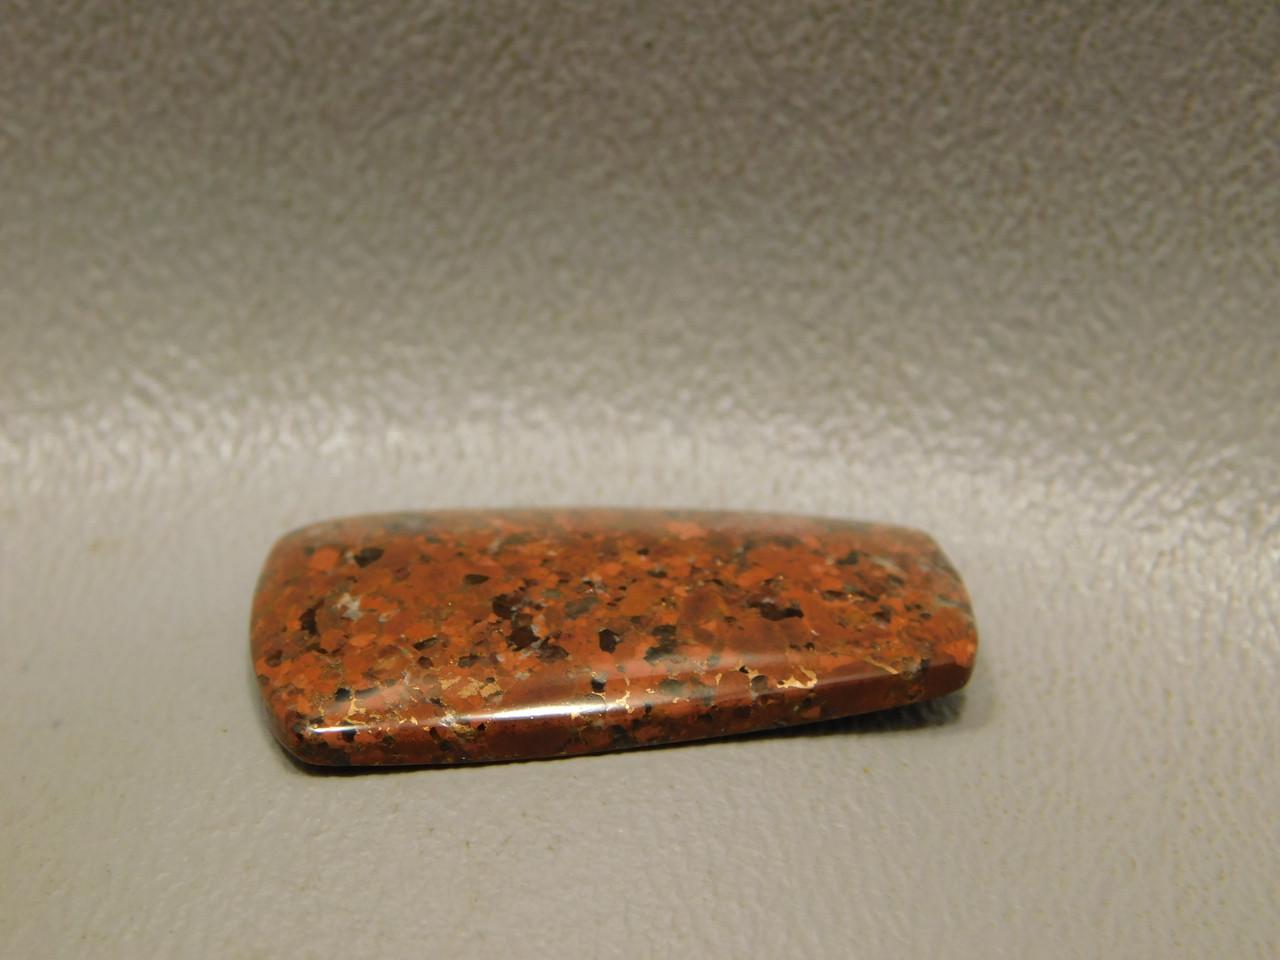 Cabochon Copper Rose Native Copper Stone Michigan Rare Gemstone 18